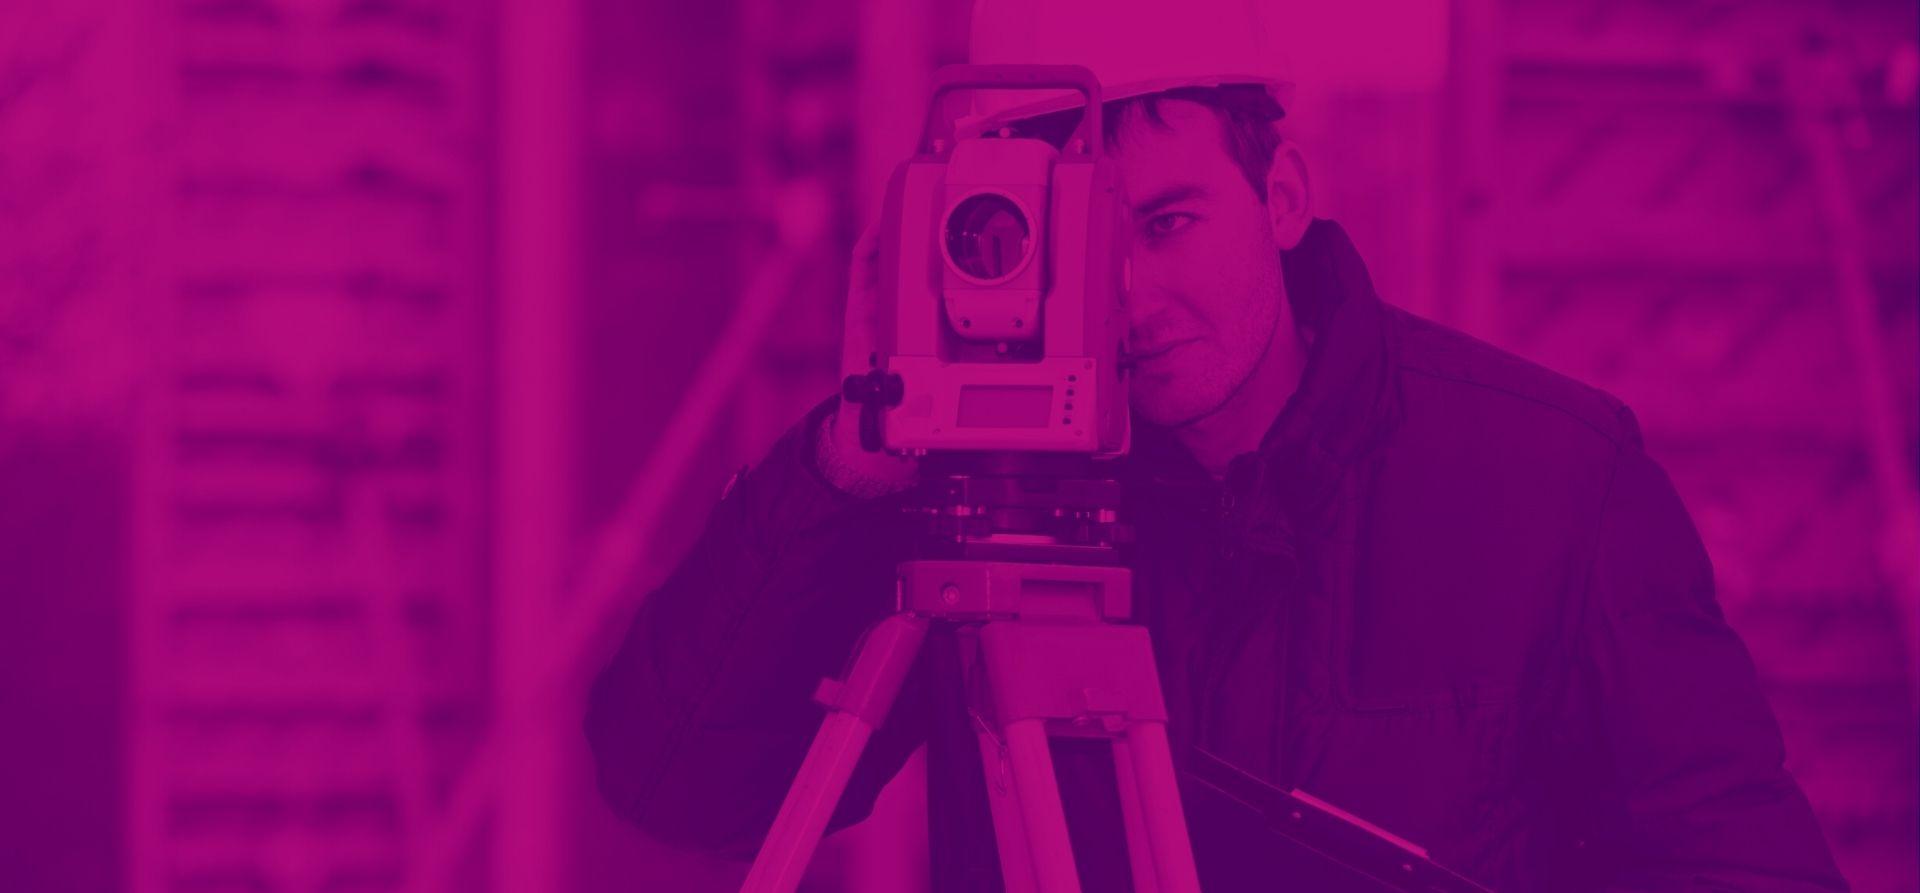 Meet Noah, Graduate Quantity Surveyor at Linear Projects article